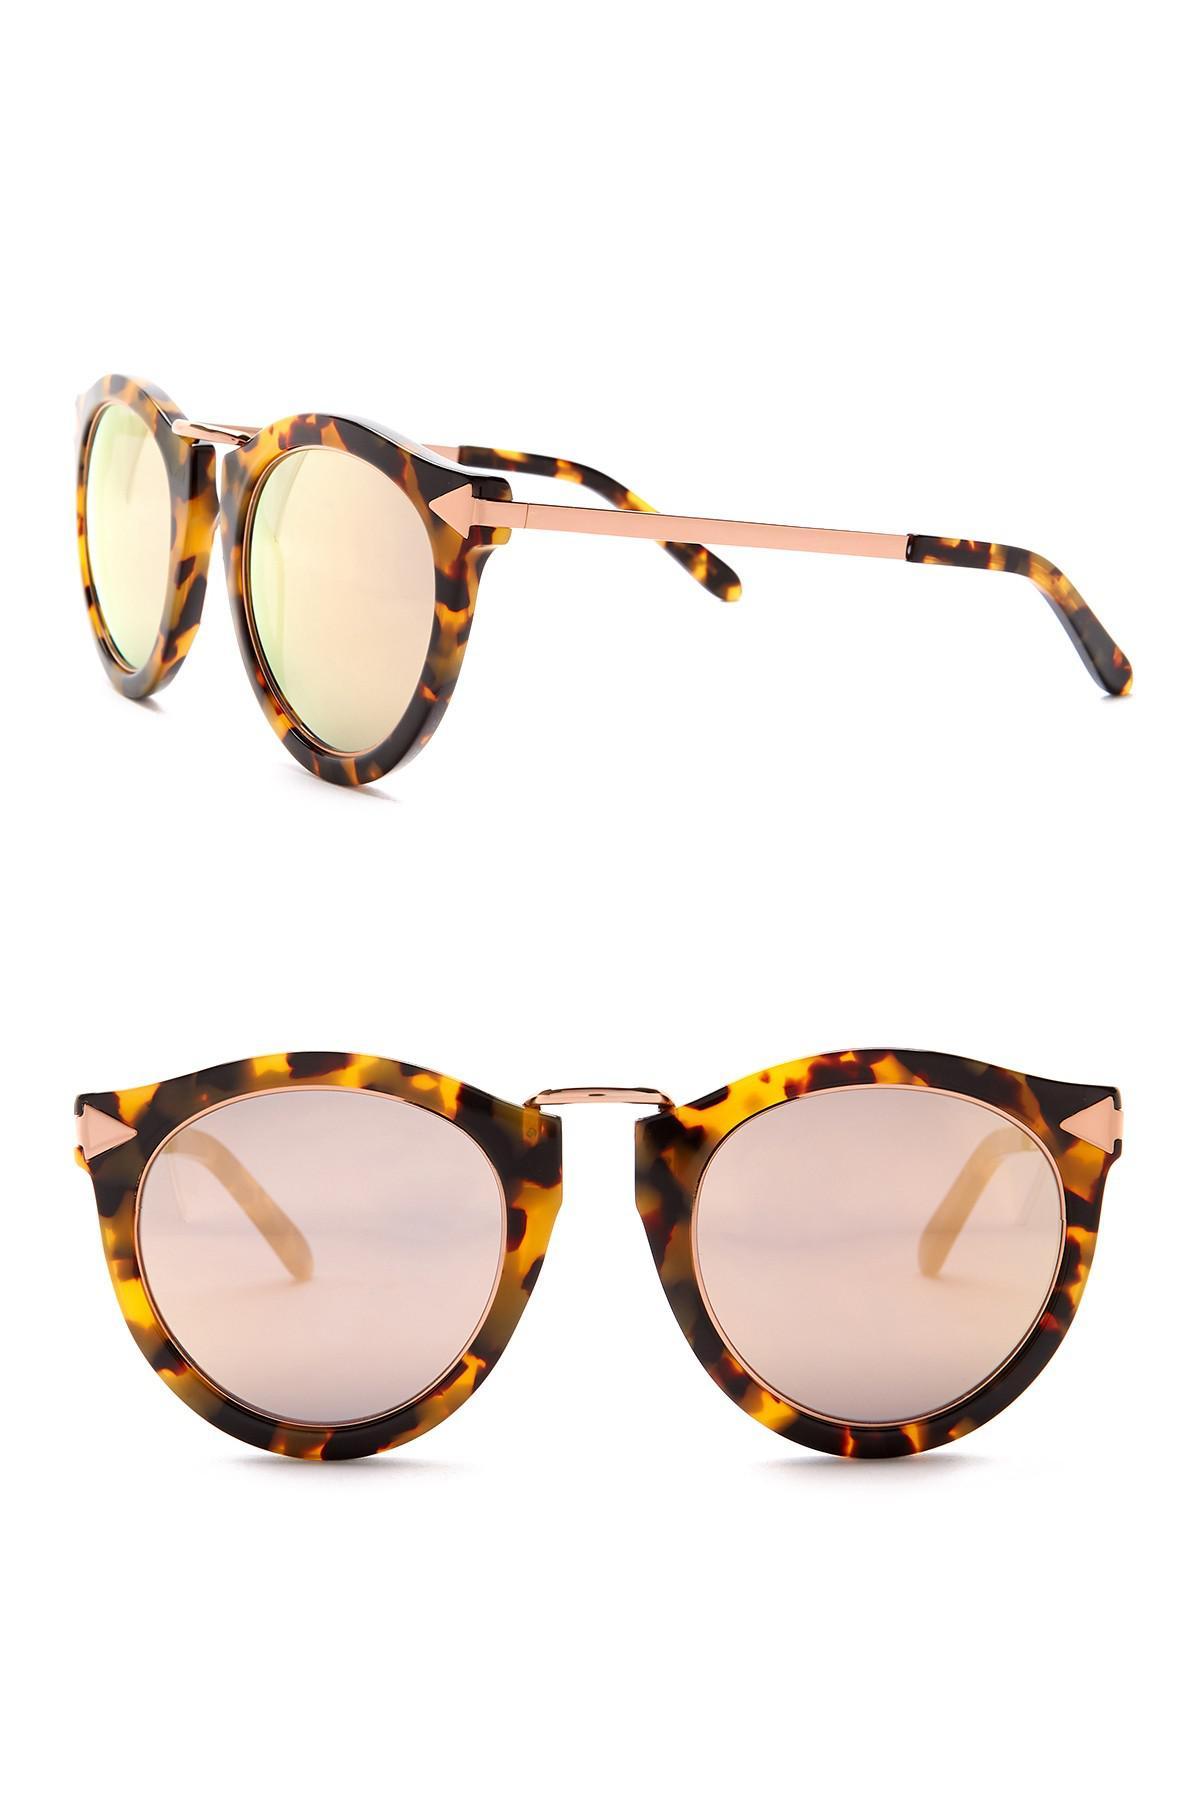 fdc4bd11ae0 Lyst - Karen Walker Harvest Superstars 58mm Round Sunglasses